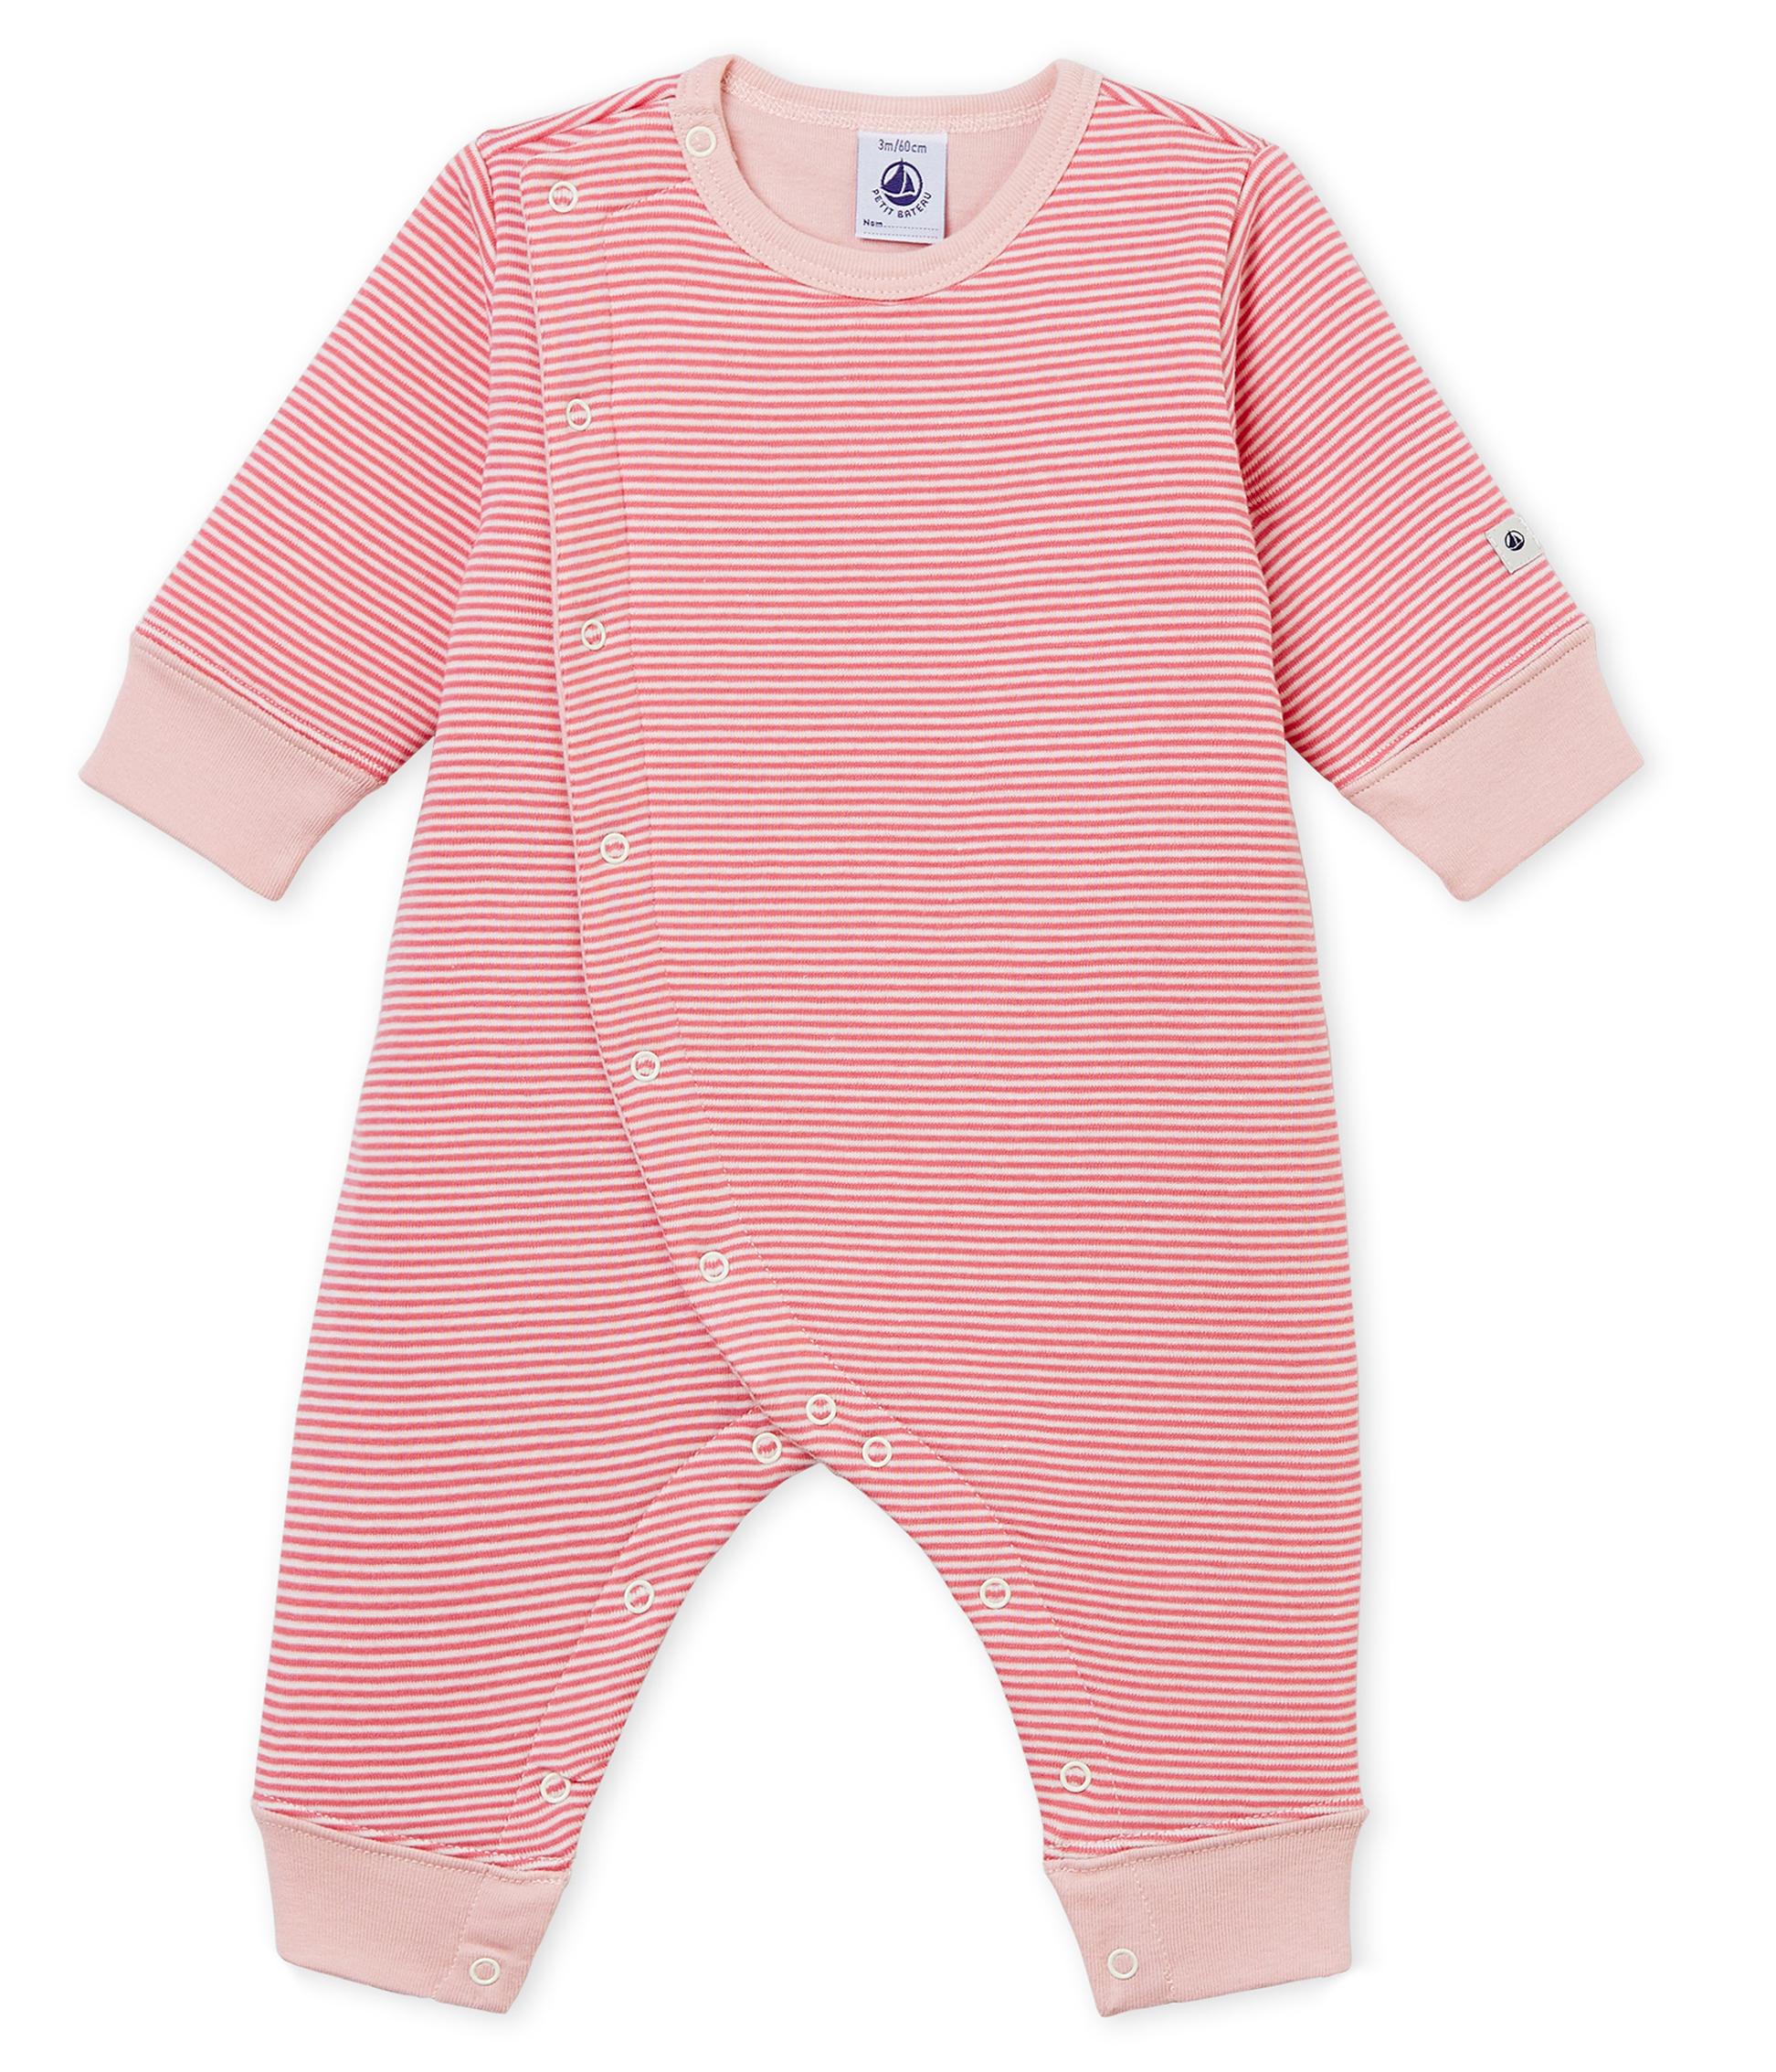 f44aa07a1 Pijama de bebé sin pies en túbico para niño | Petit Bateau